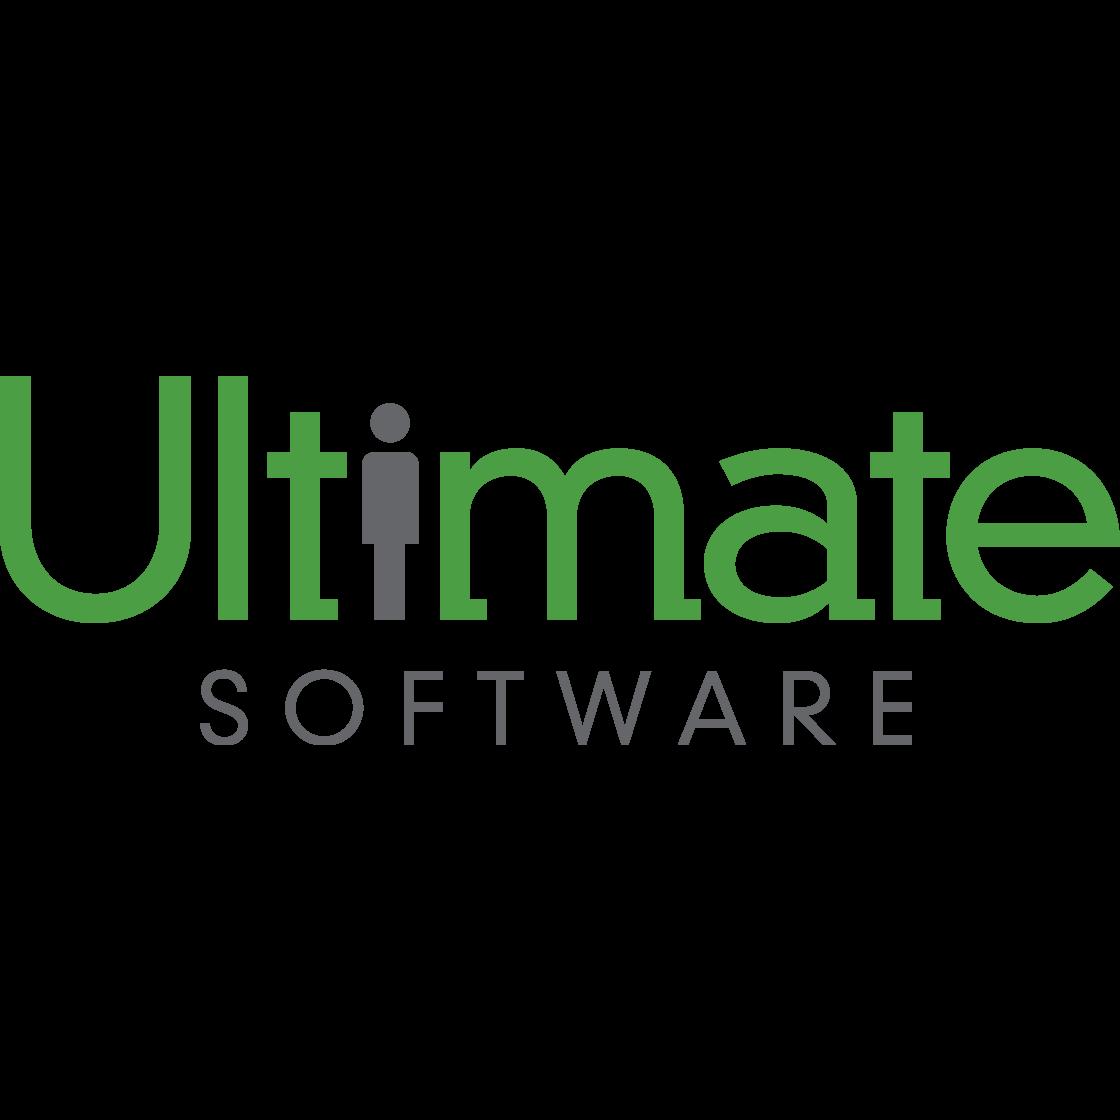 témoignage conférence wechamp ultimate software